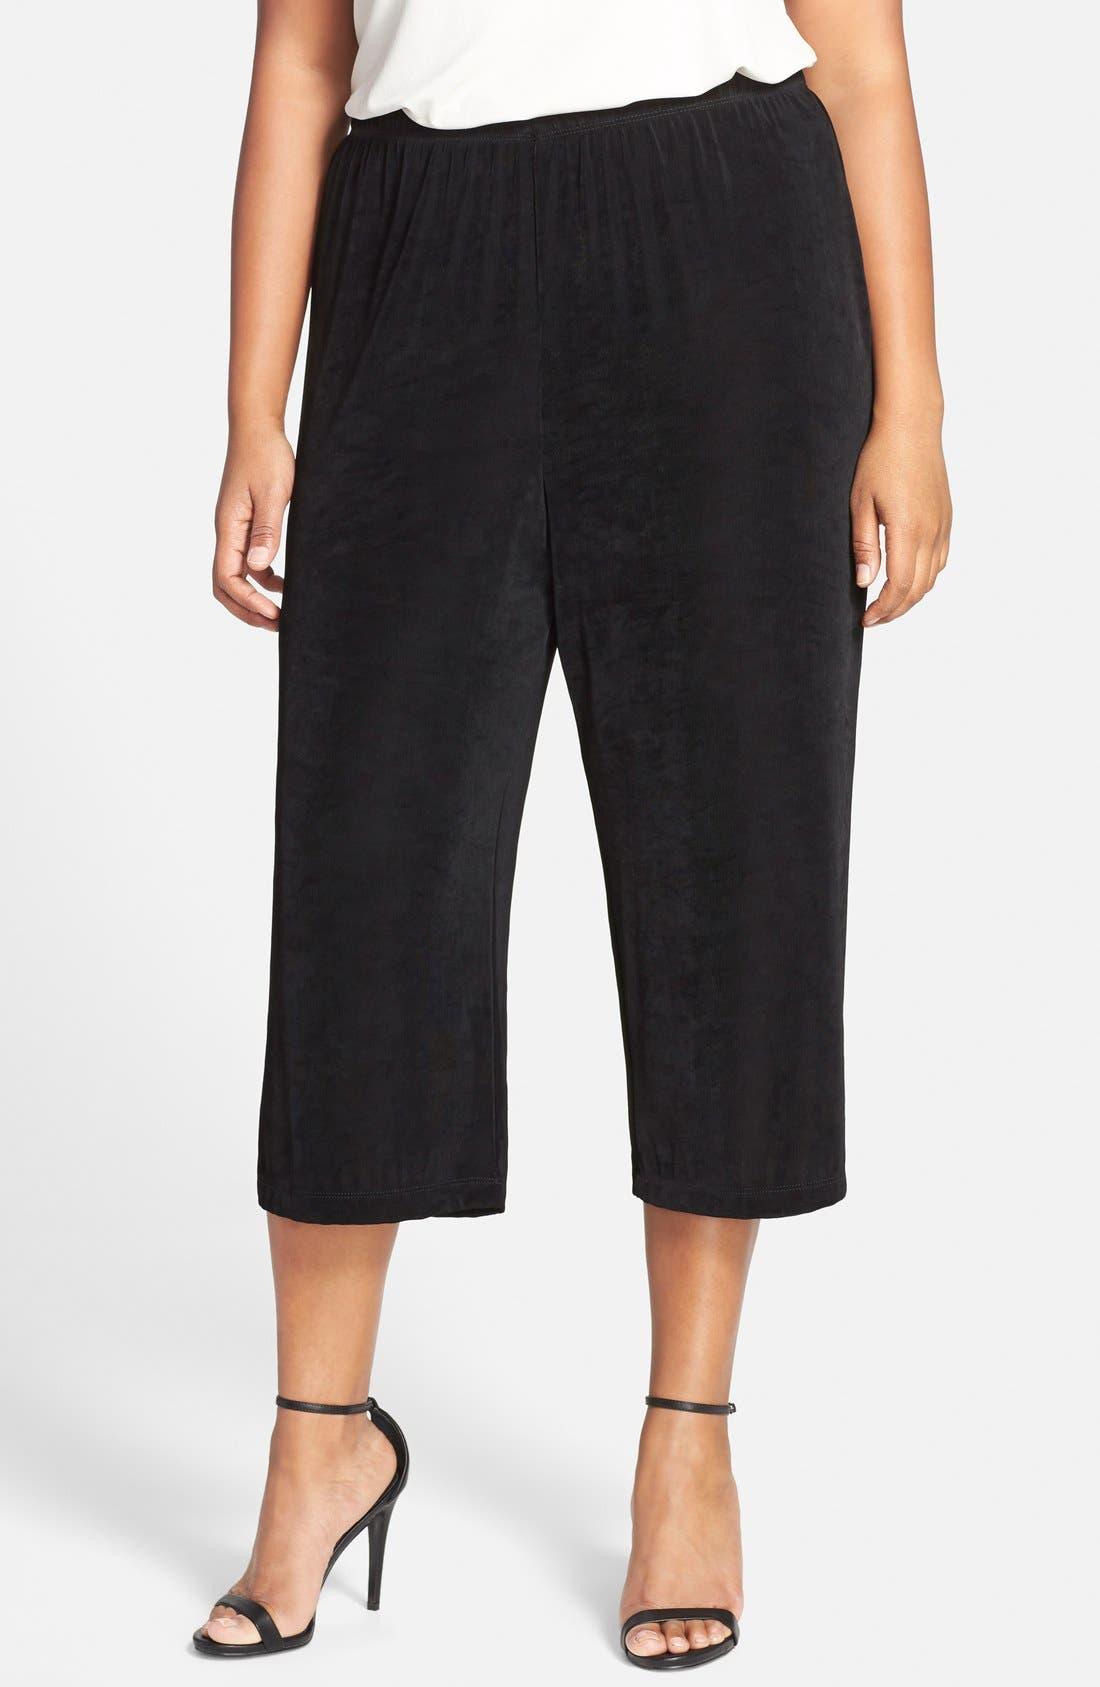 VIKKI VI High Rise Stretch Knit Crop Pants, Main, color, BLACK